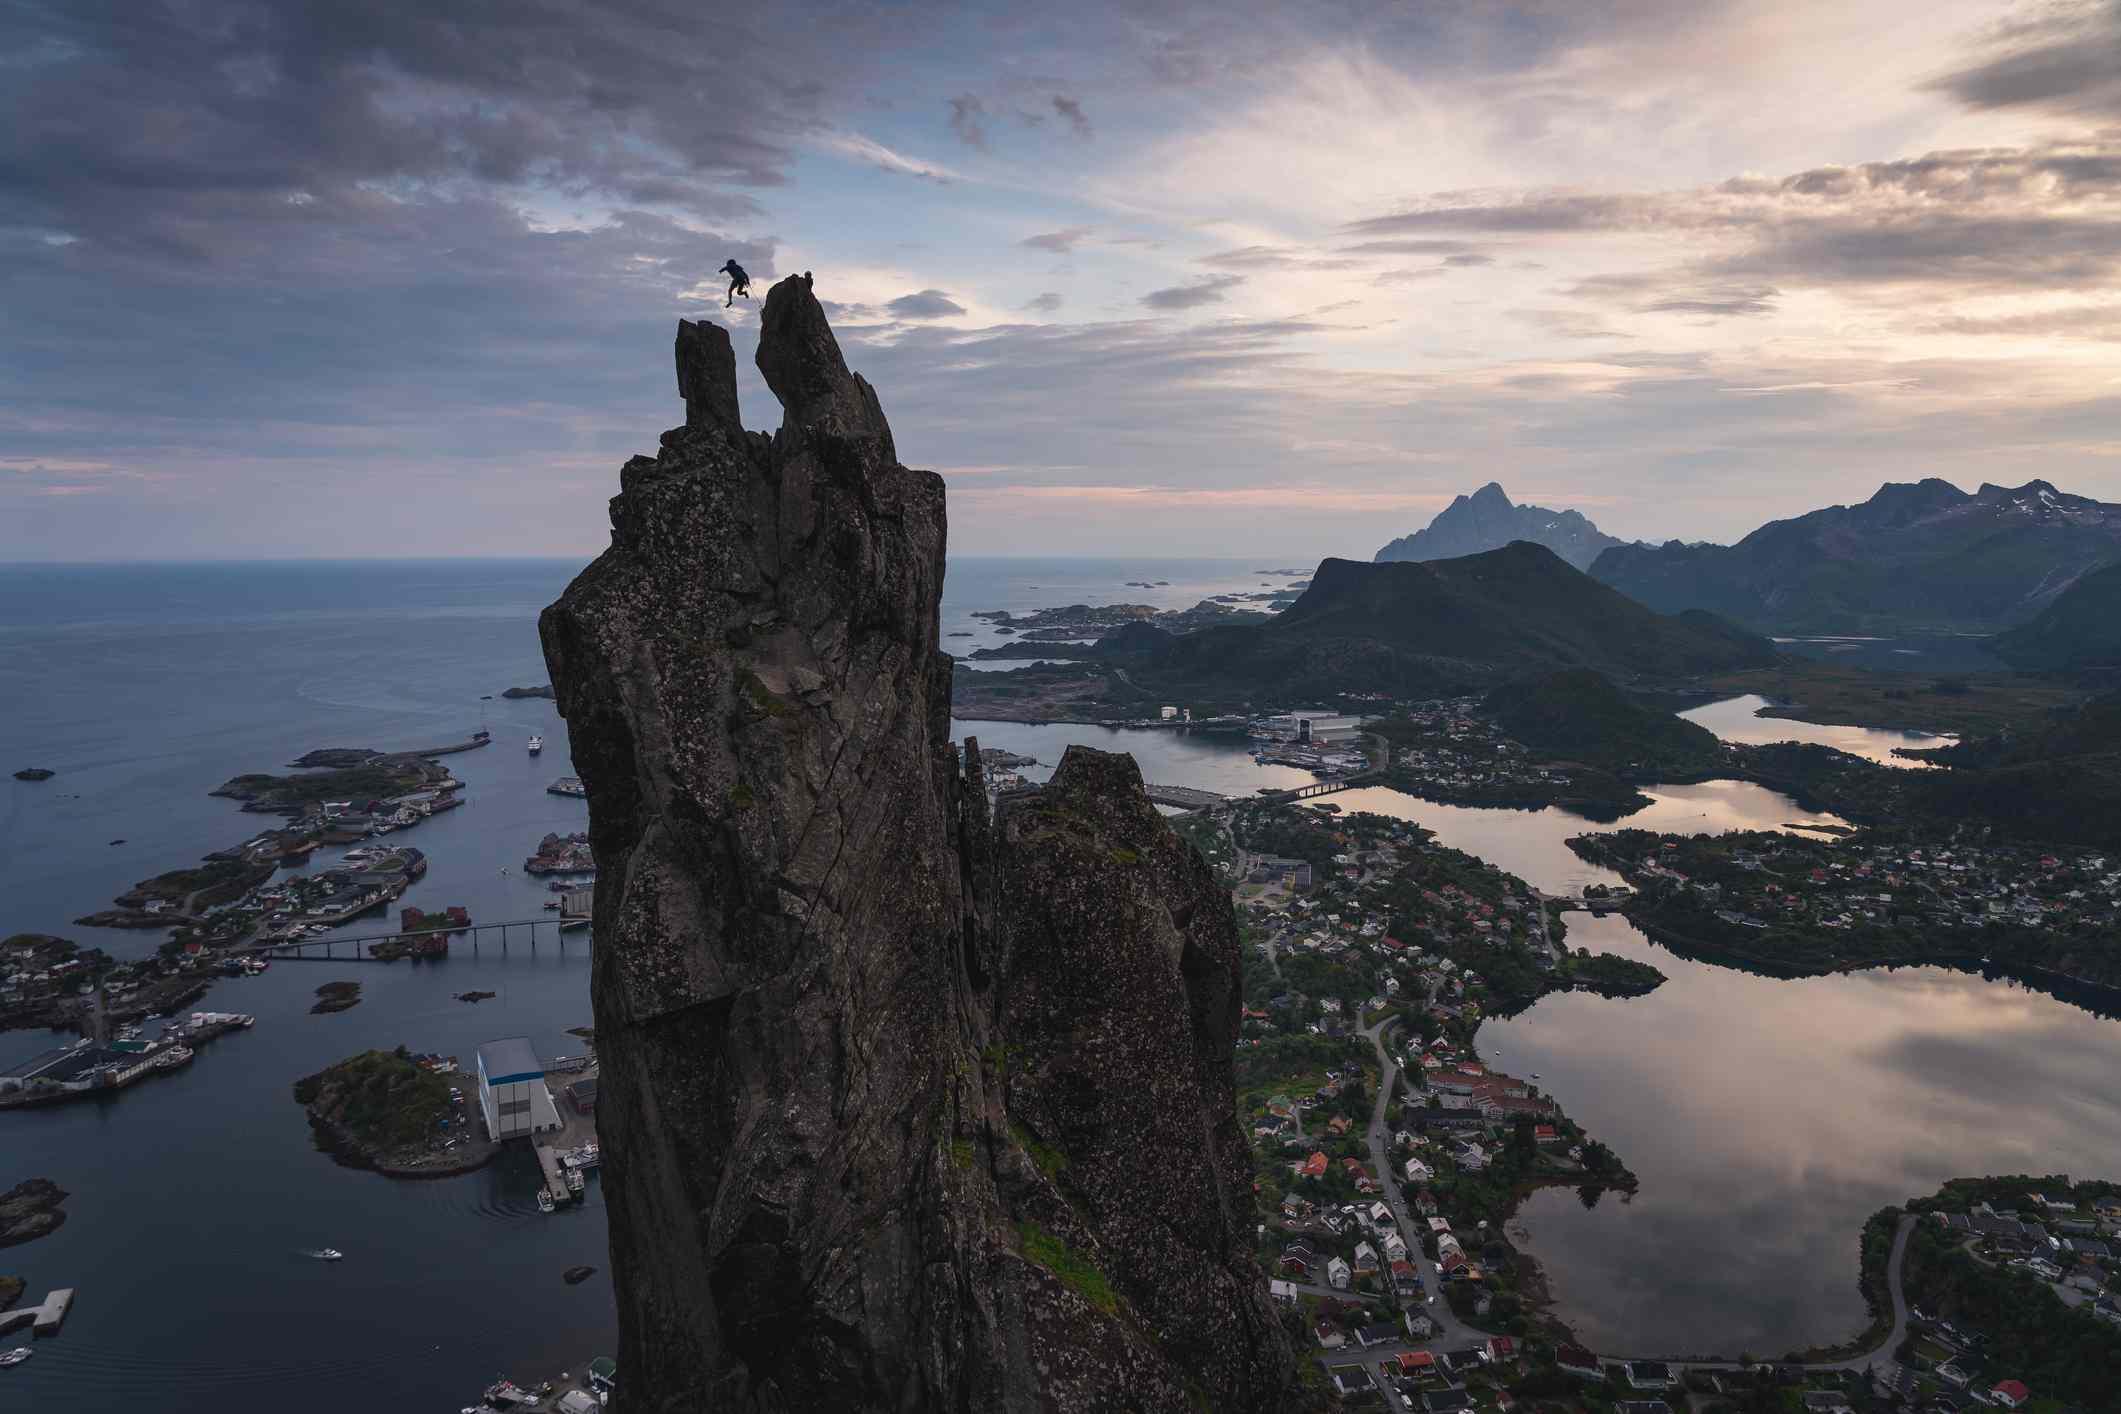 Svolvaergeita or the goat is a pinnacle of rock on top of Svolvaer town, Lofoten island, Norway, Scandinavia